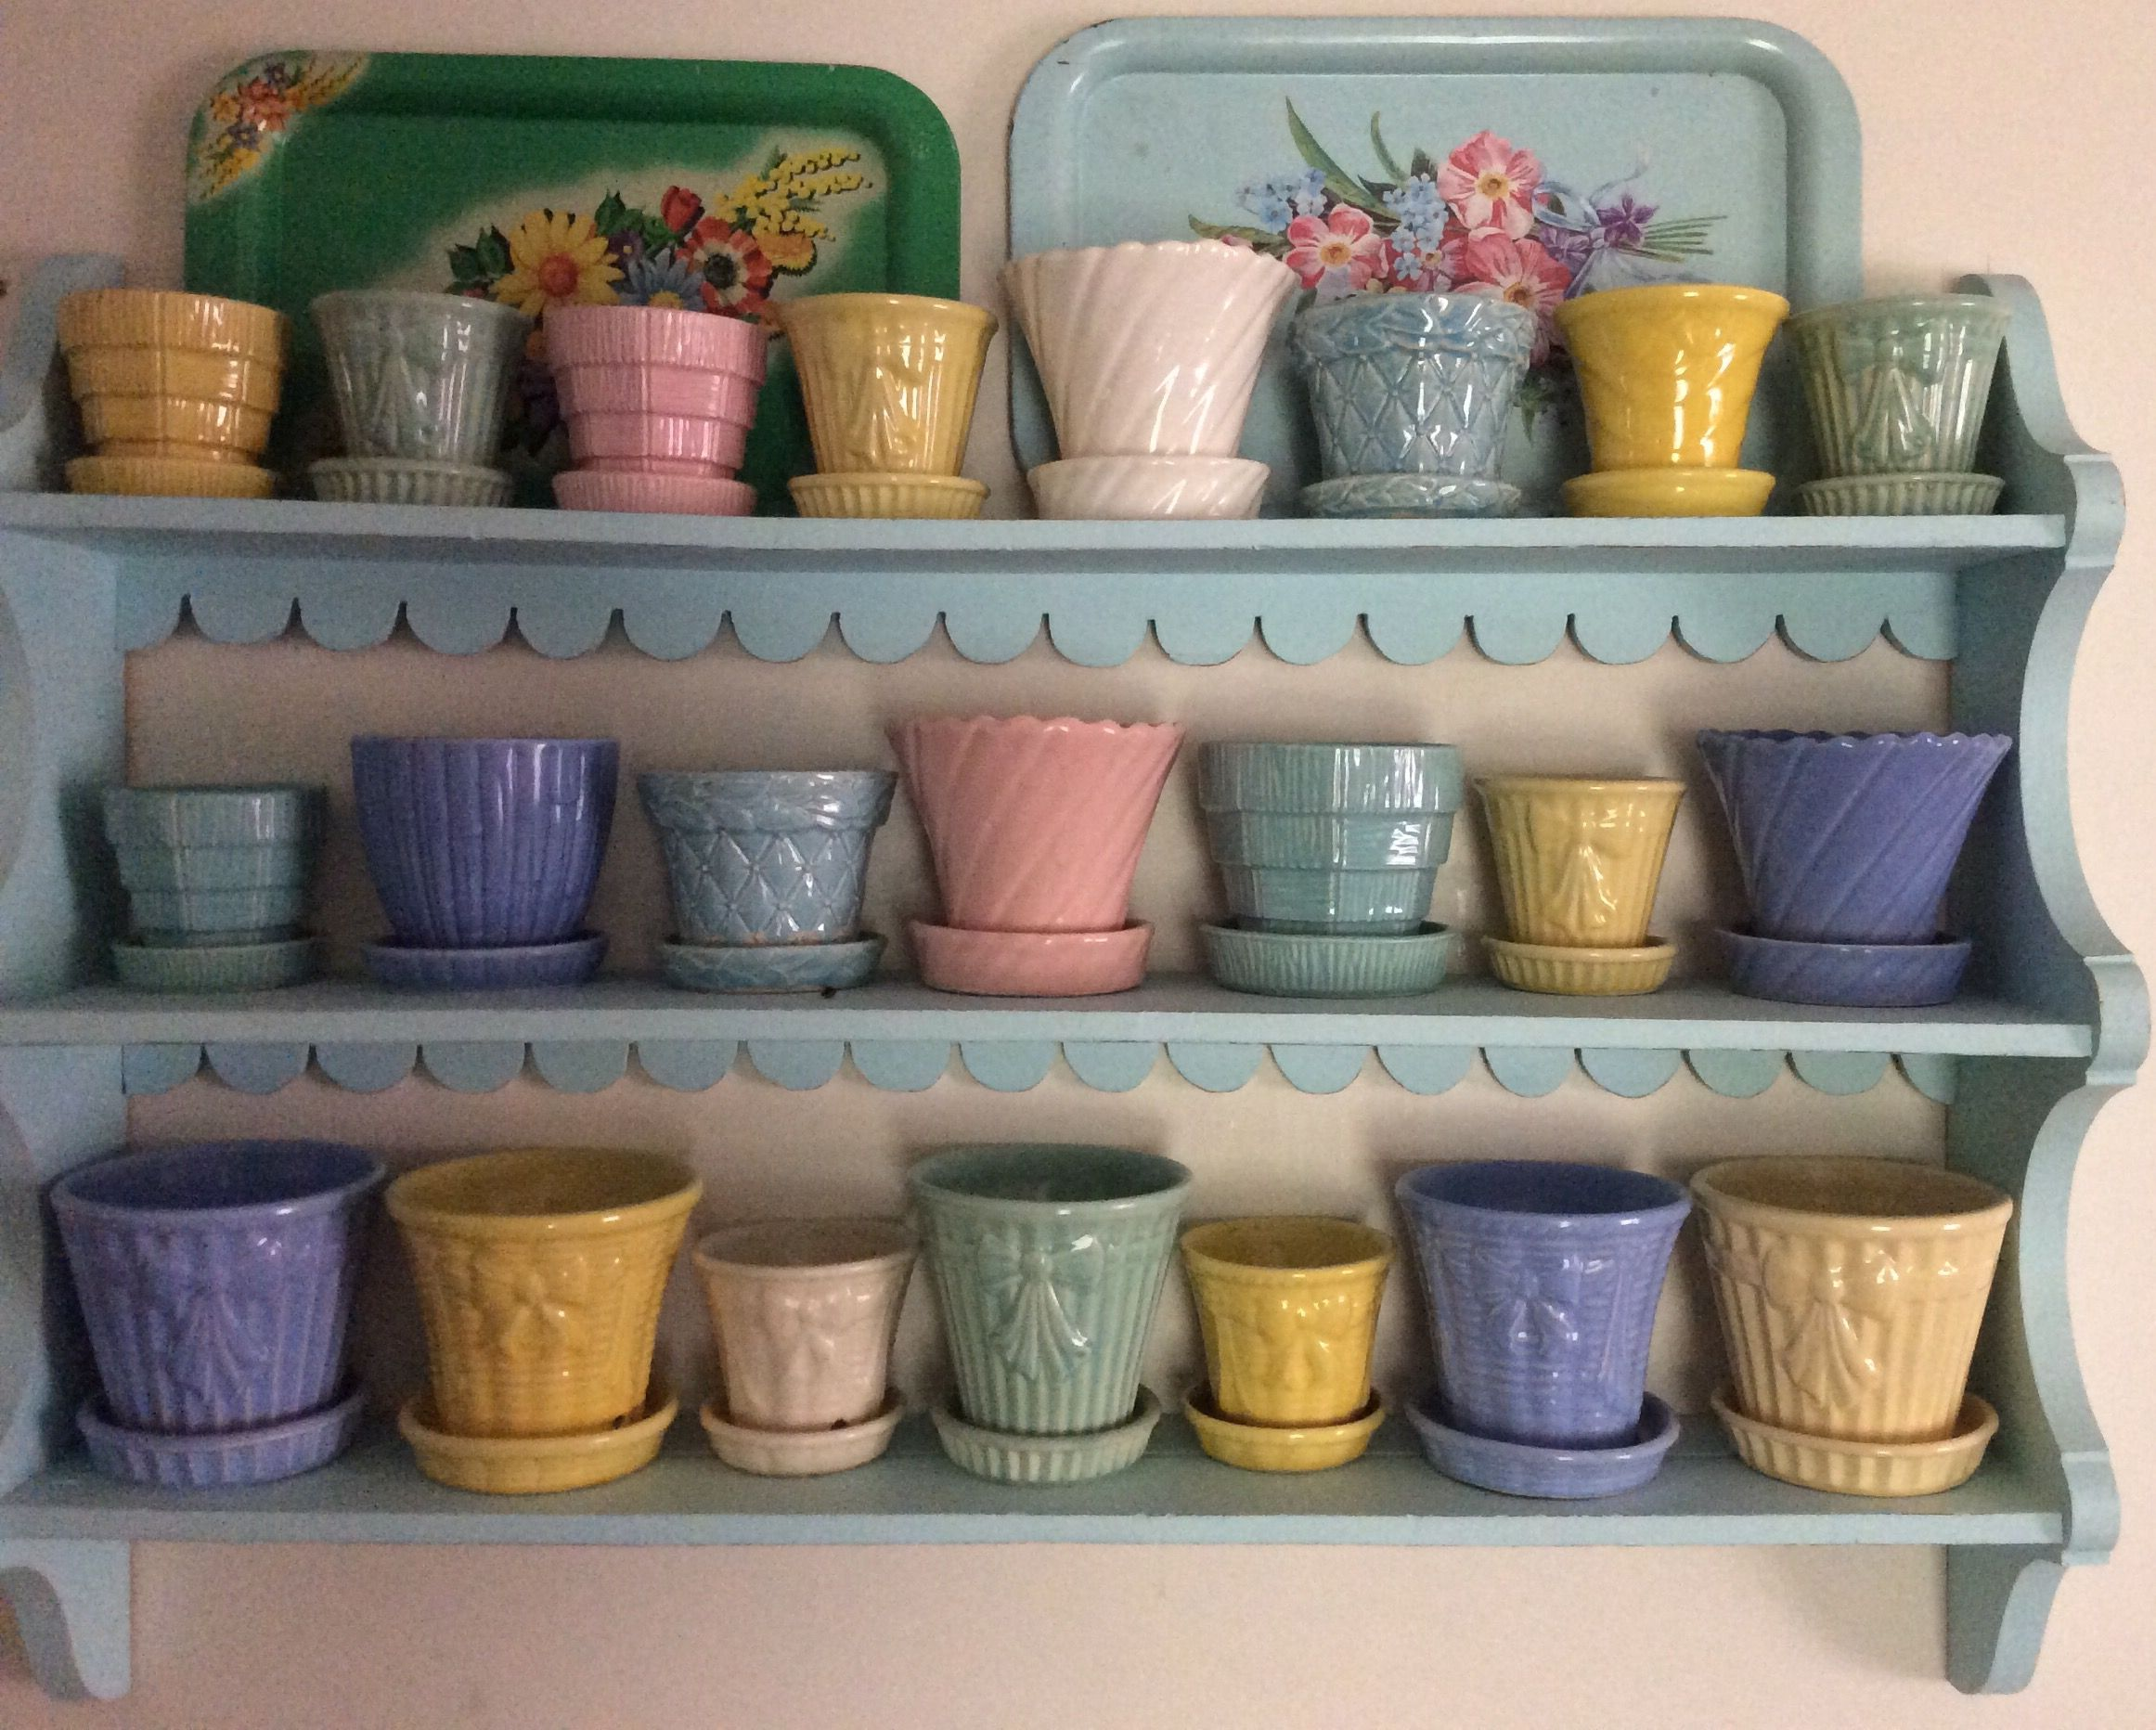 Pin By Kelly Gabriel On Vintage Pottery Love Pottery Display Mccoy Pottery Vases Vintage Flower Pots